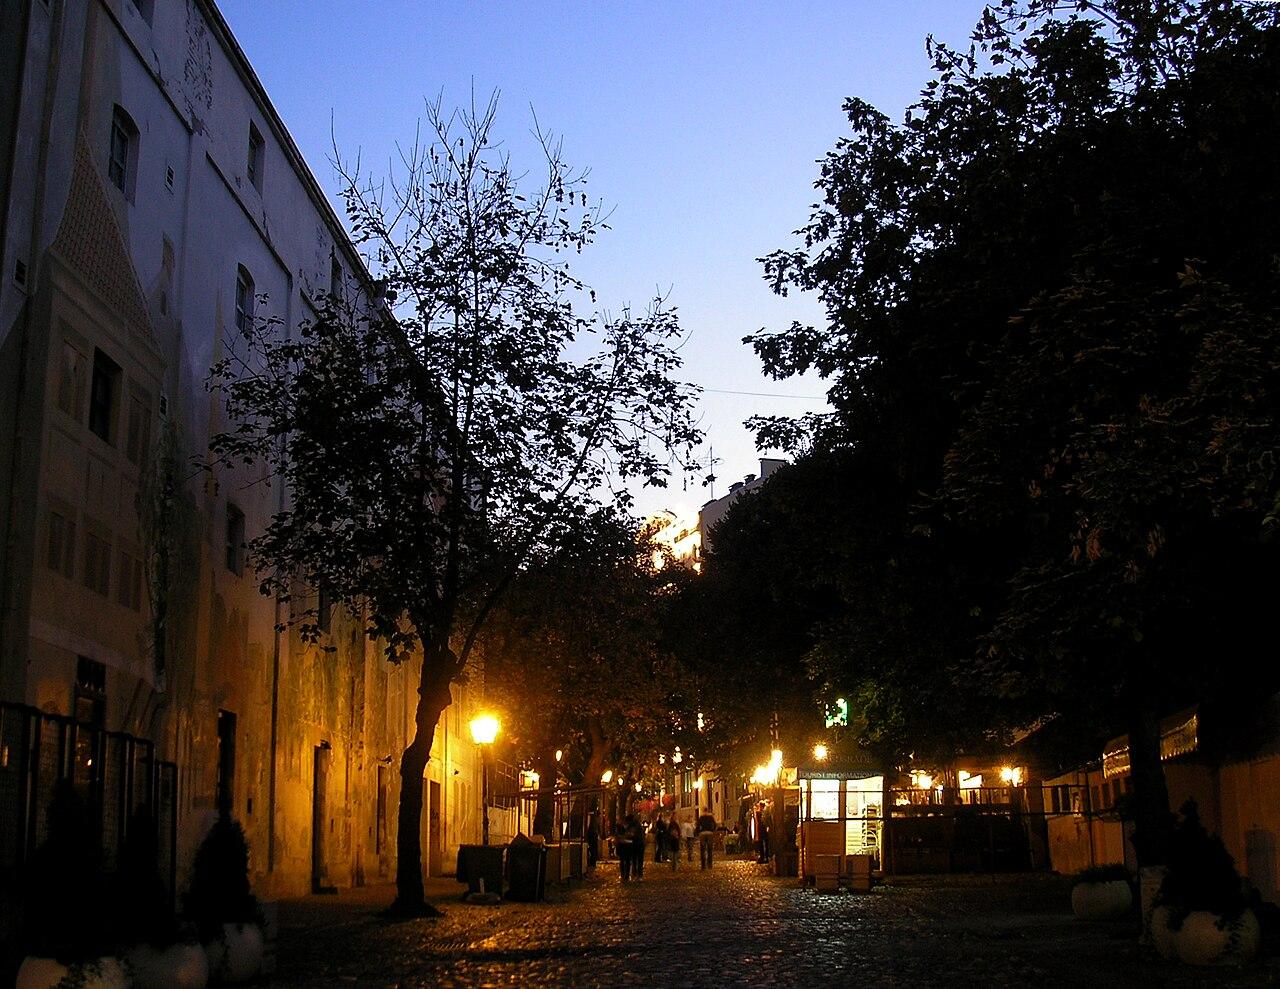 Px Beograd Skadarlija Street In Evening C